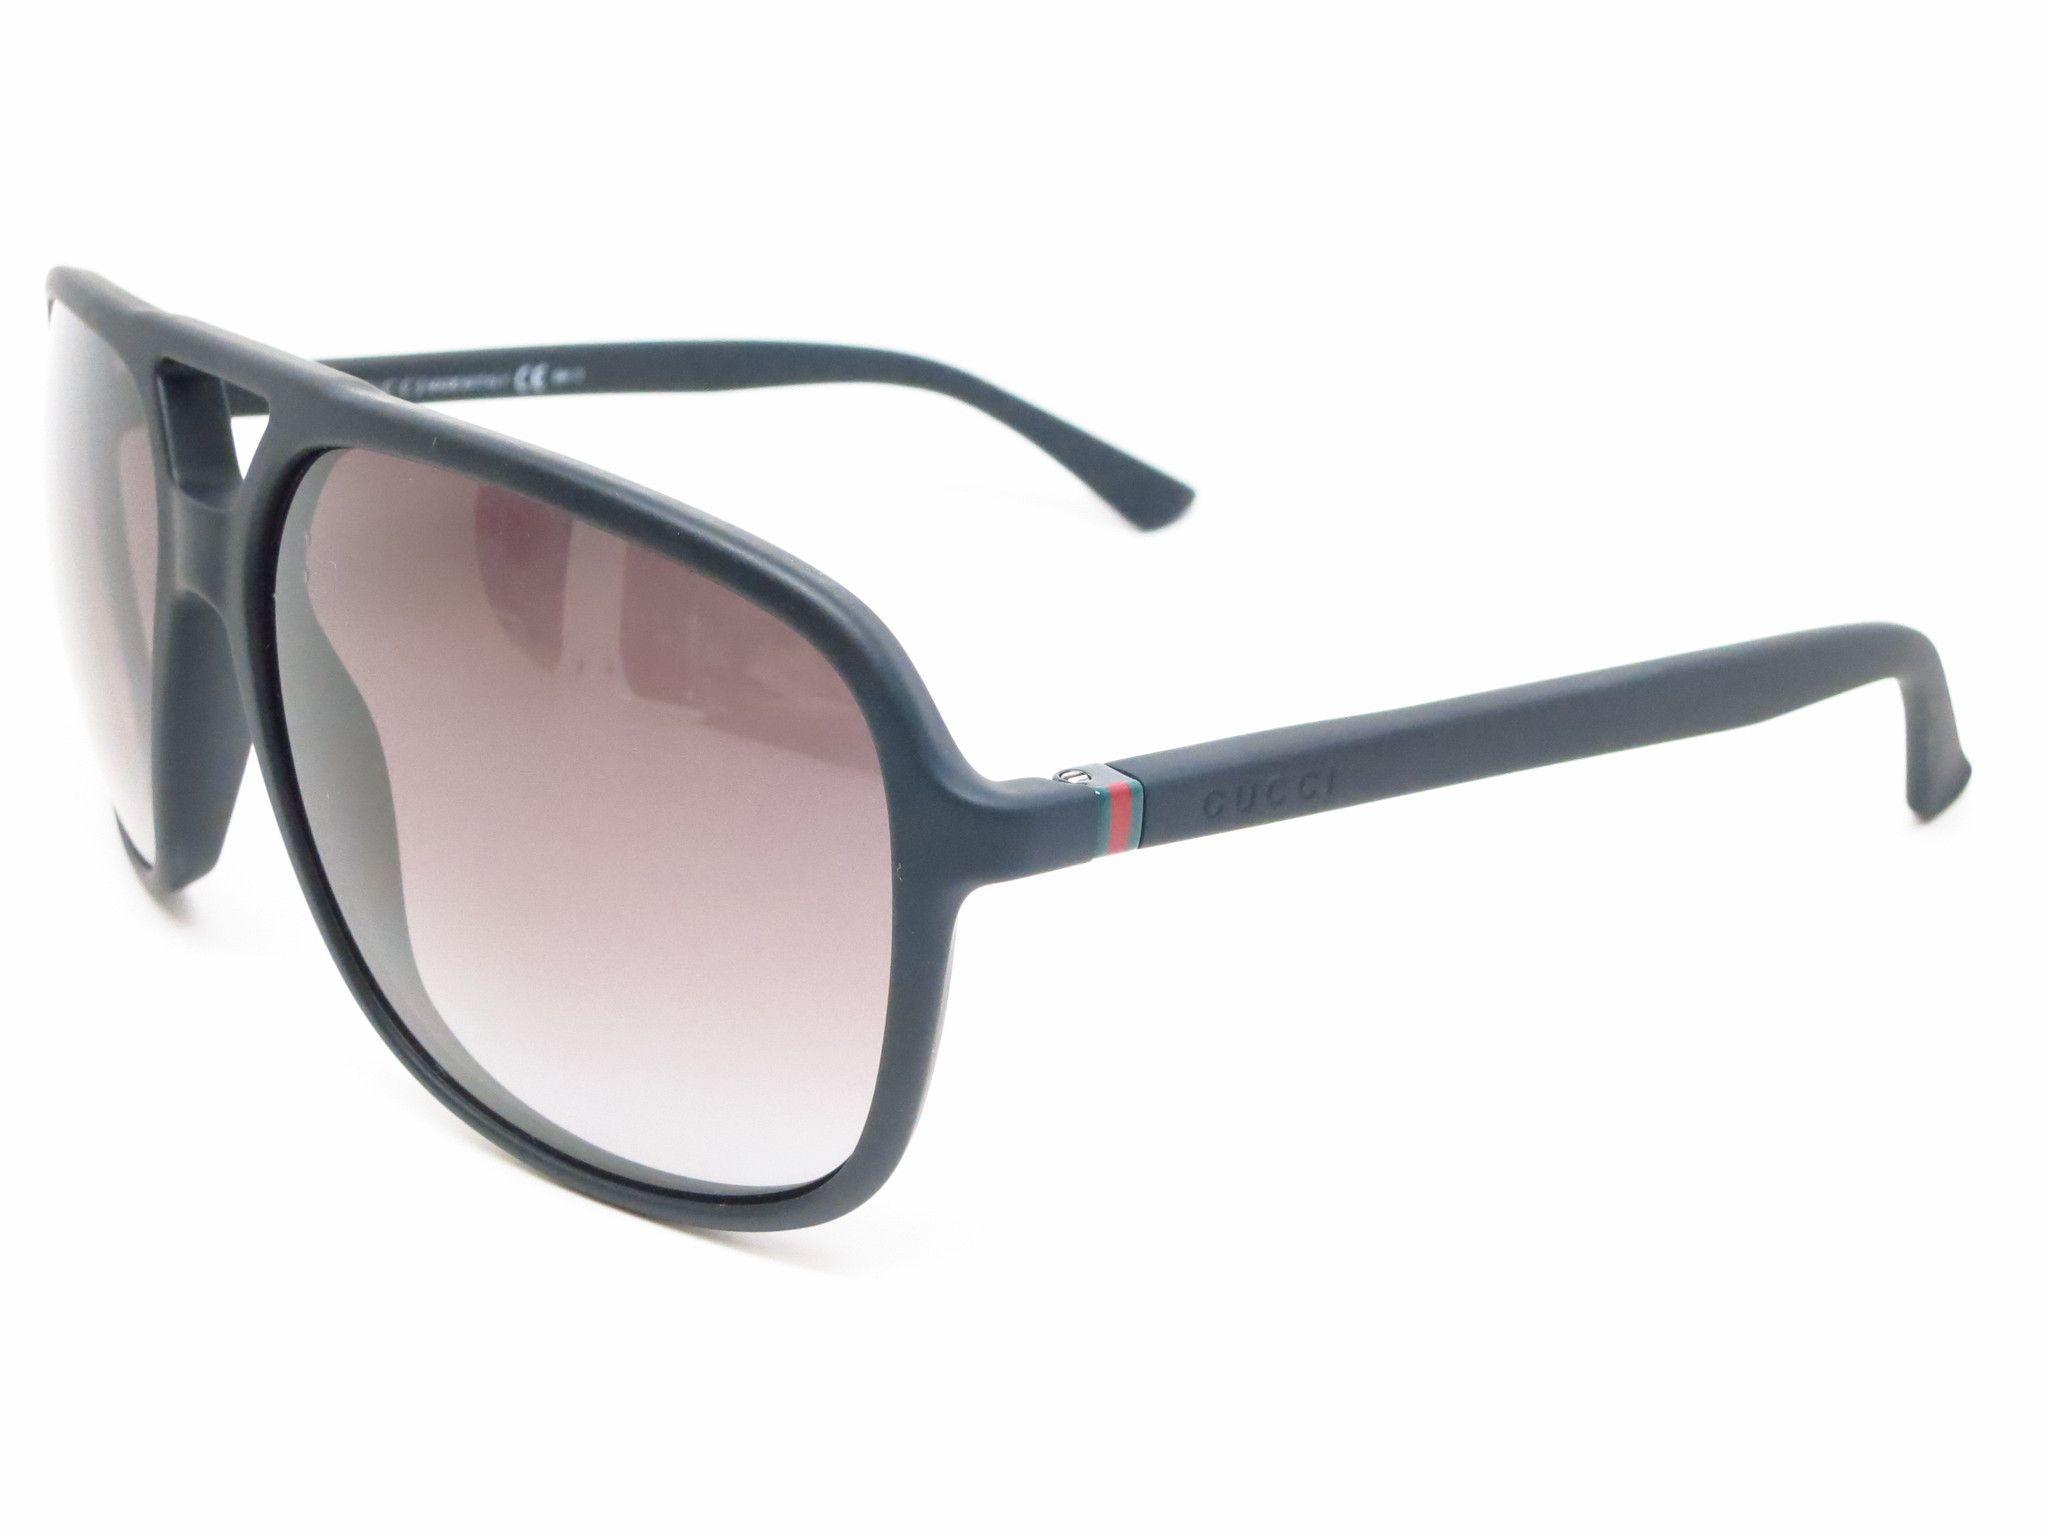 d2446d45511 Gucci GG 1091 S D28N6 Black Sunglasses